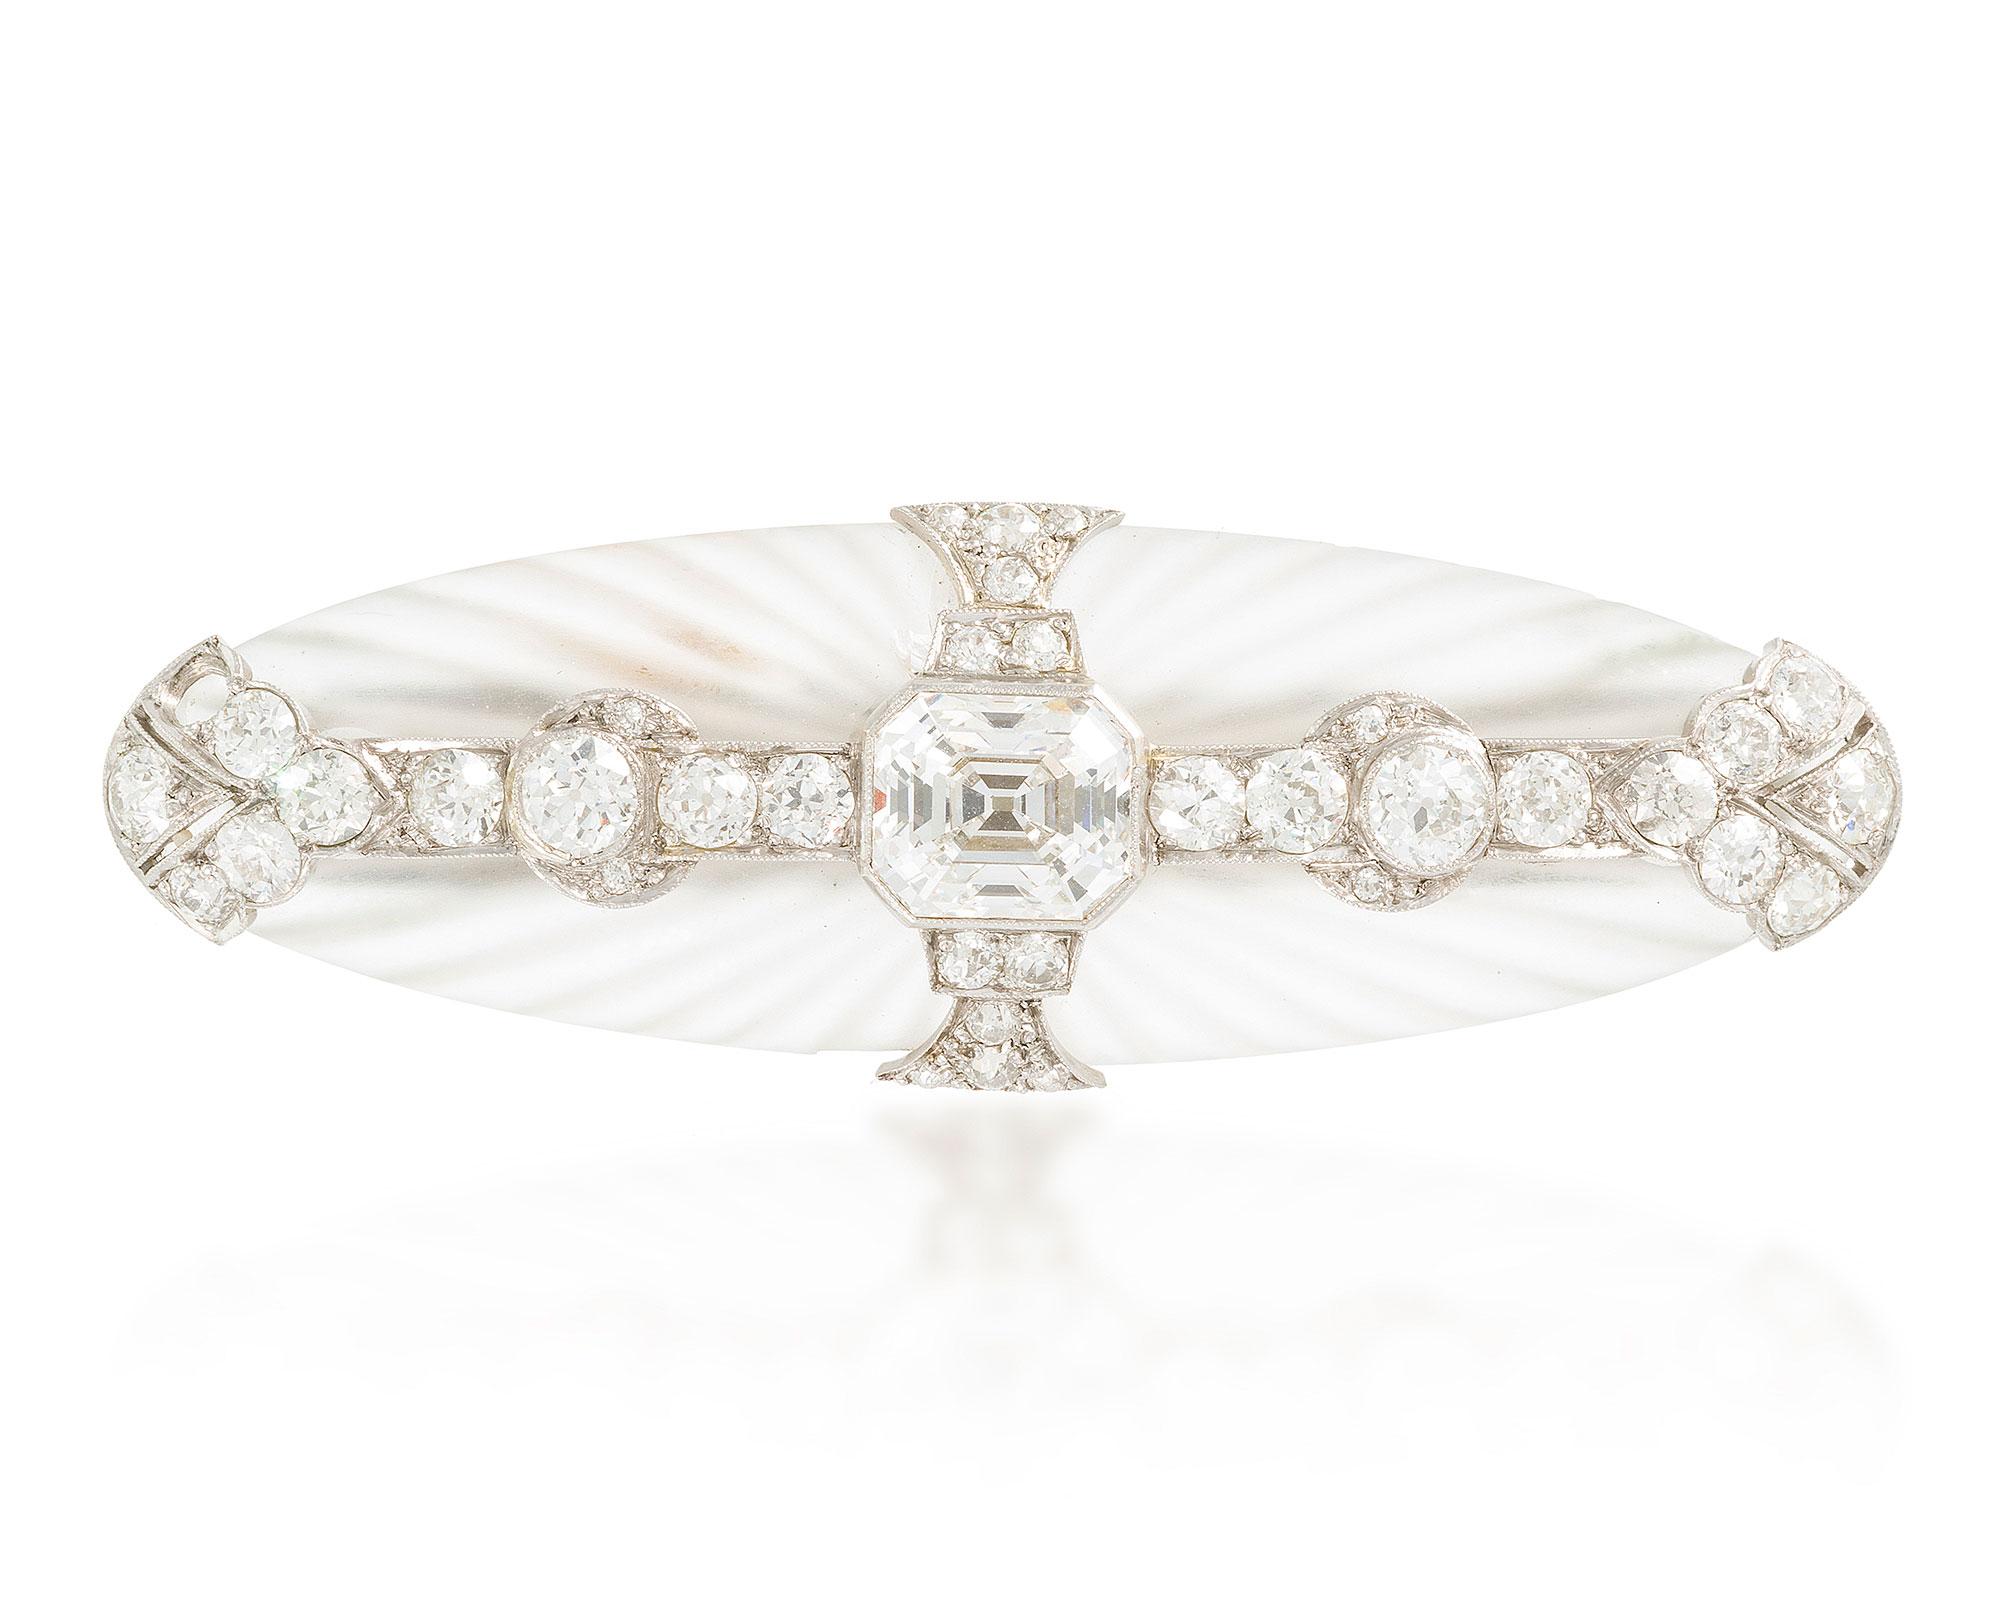 An Art Deco diamond and rock crystal brooch $30,000-50,000